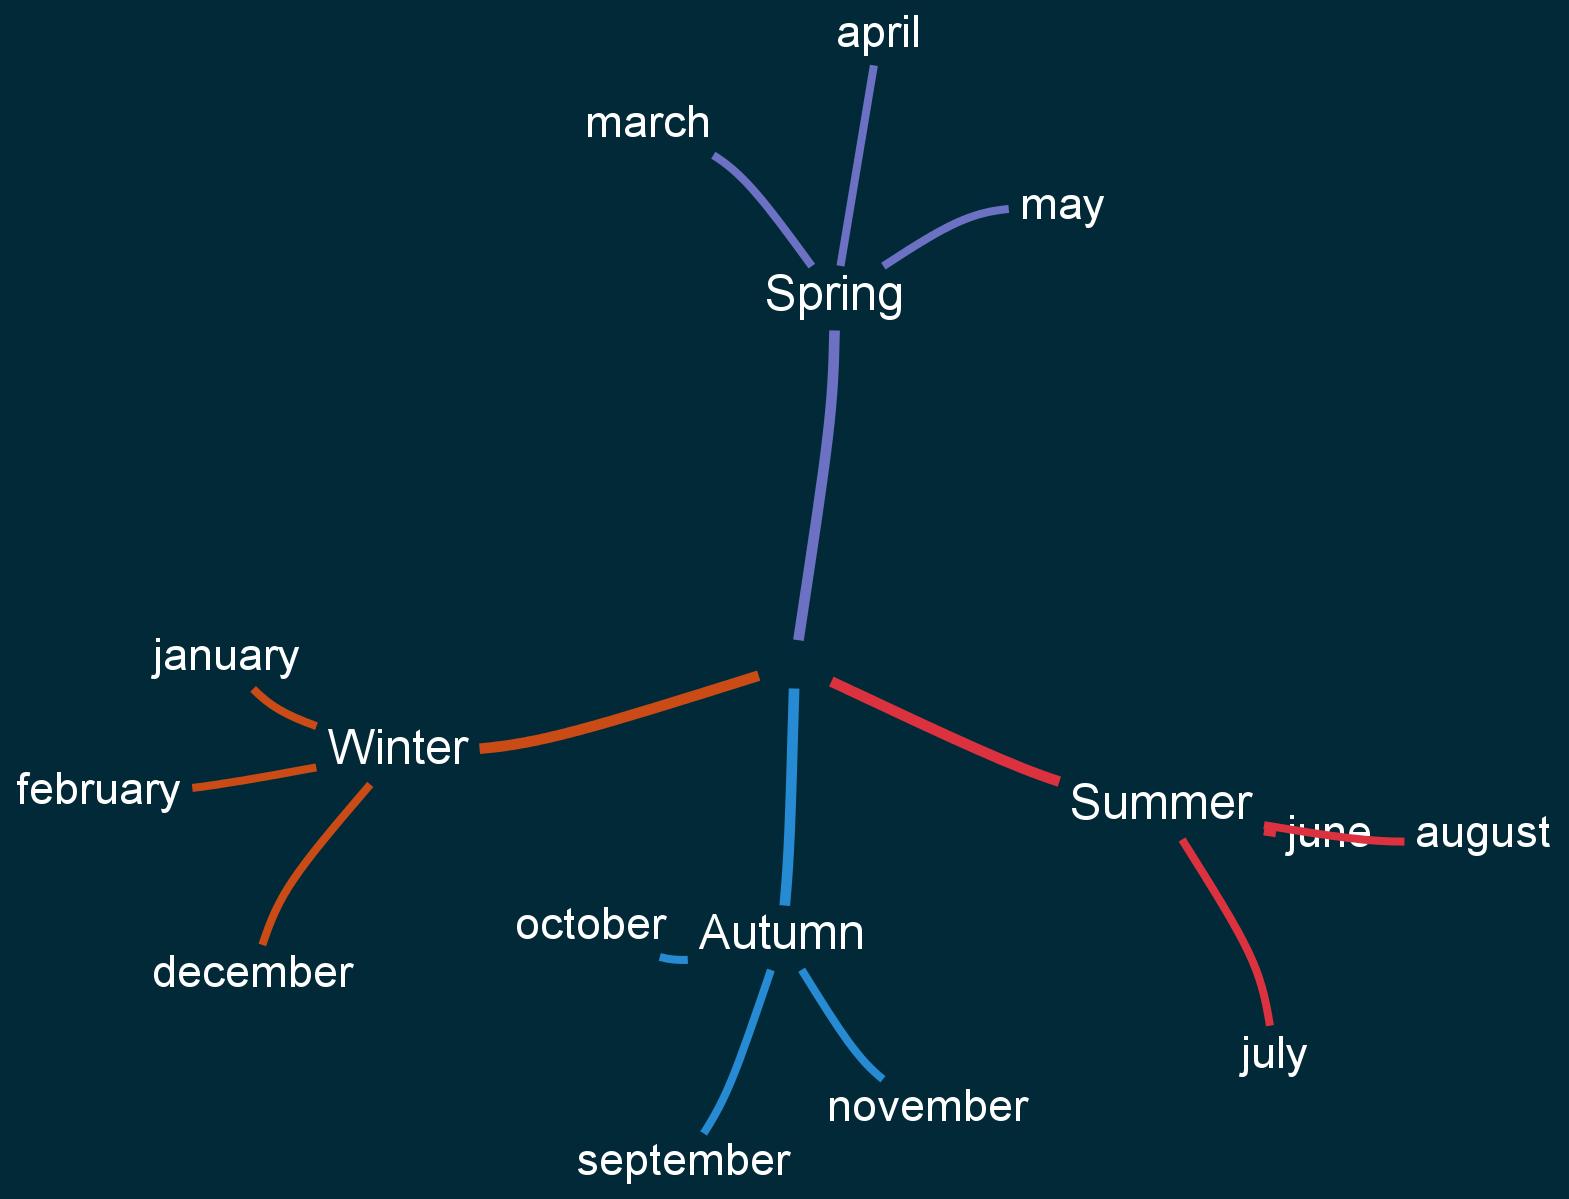 sfdp layout